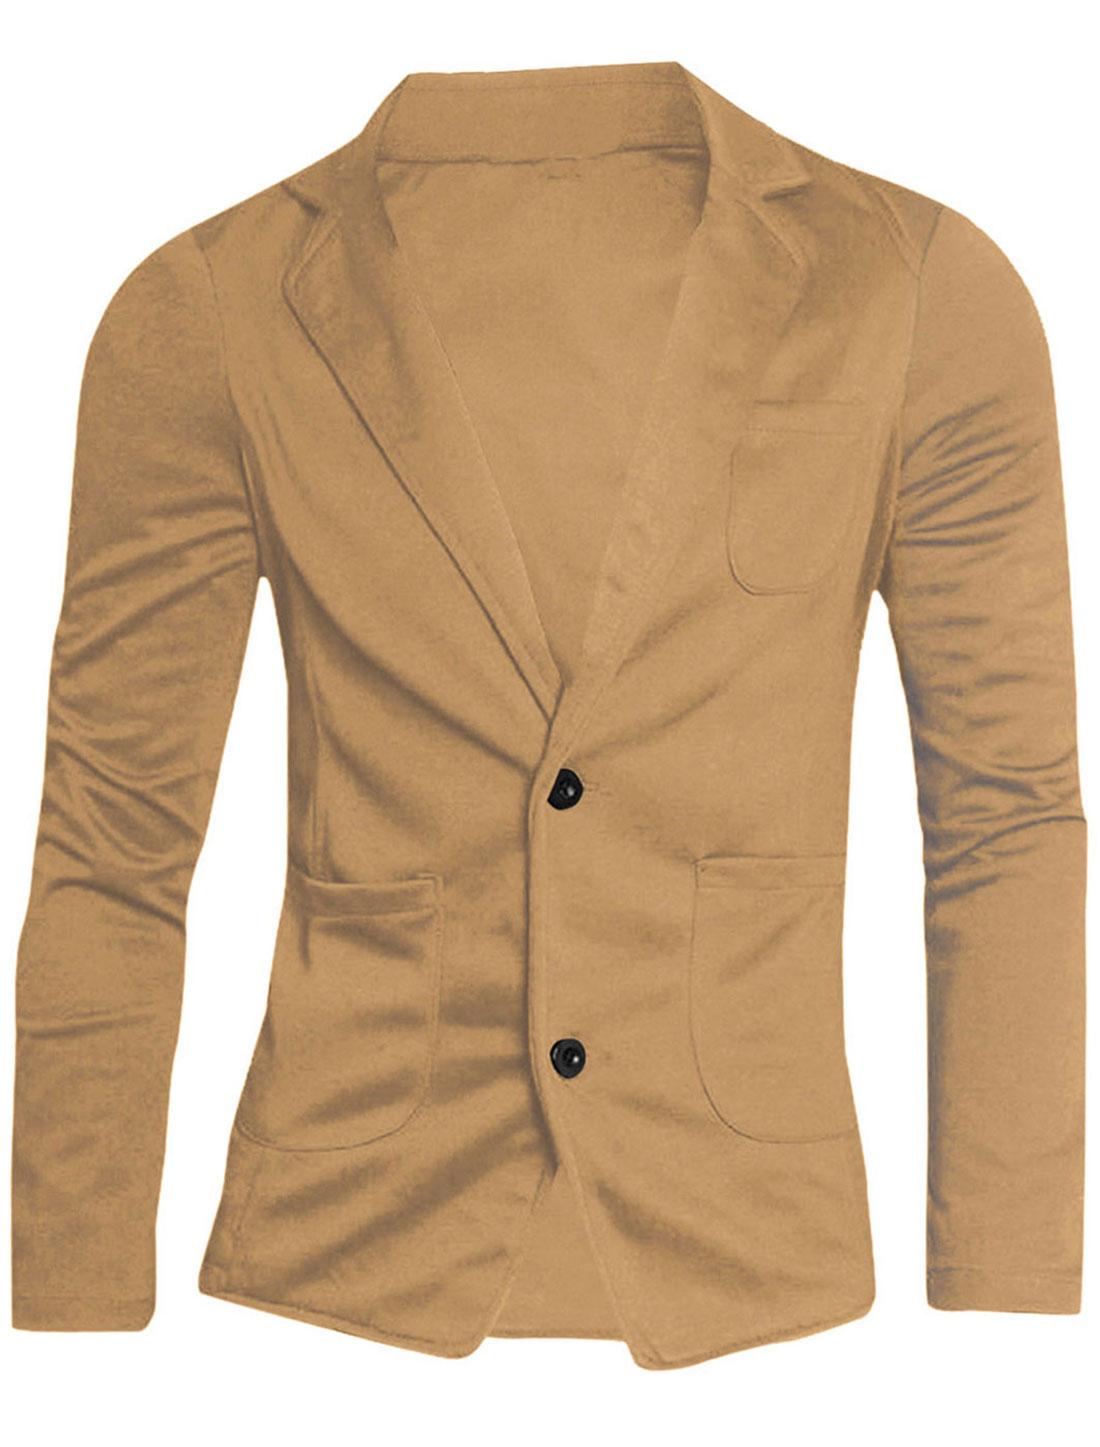 Men Notched Lapel Solid Color Long Sleeve Knit Blazer Beige 34